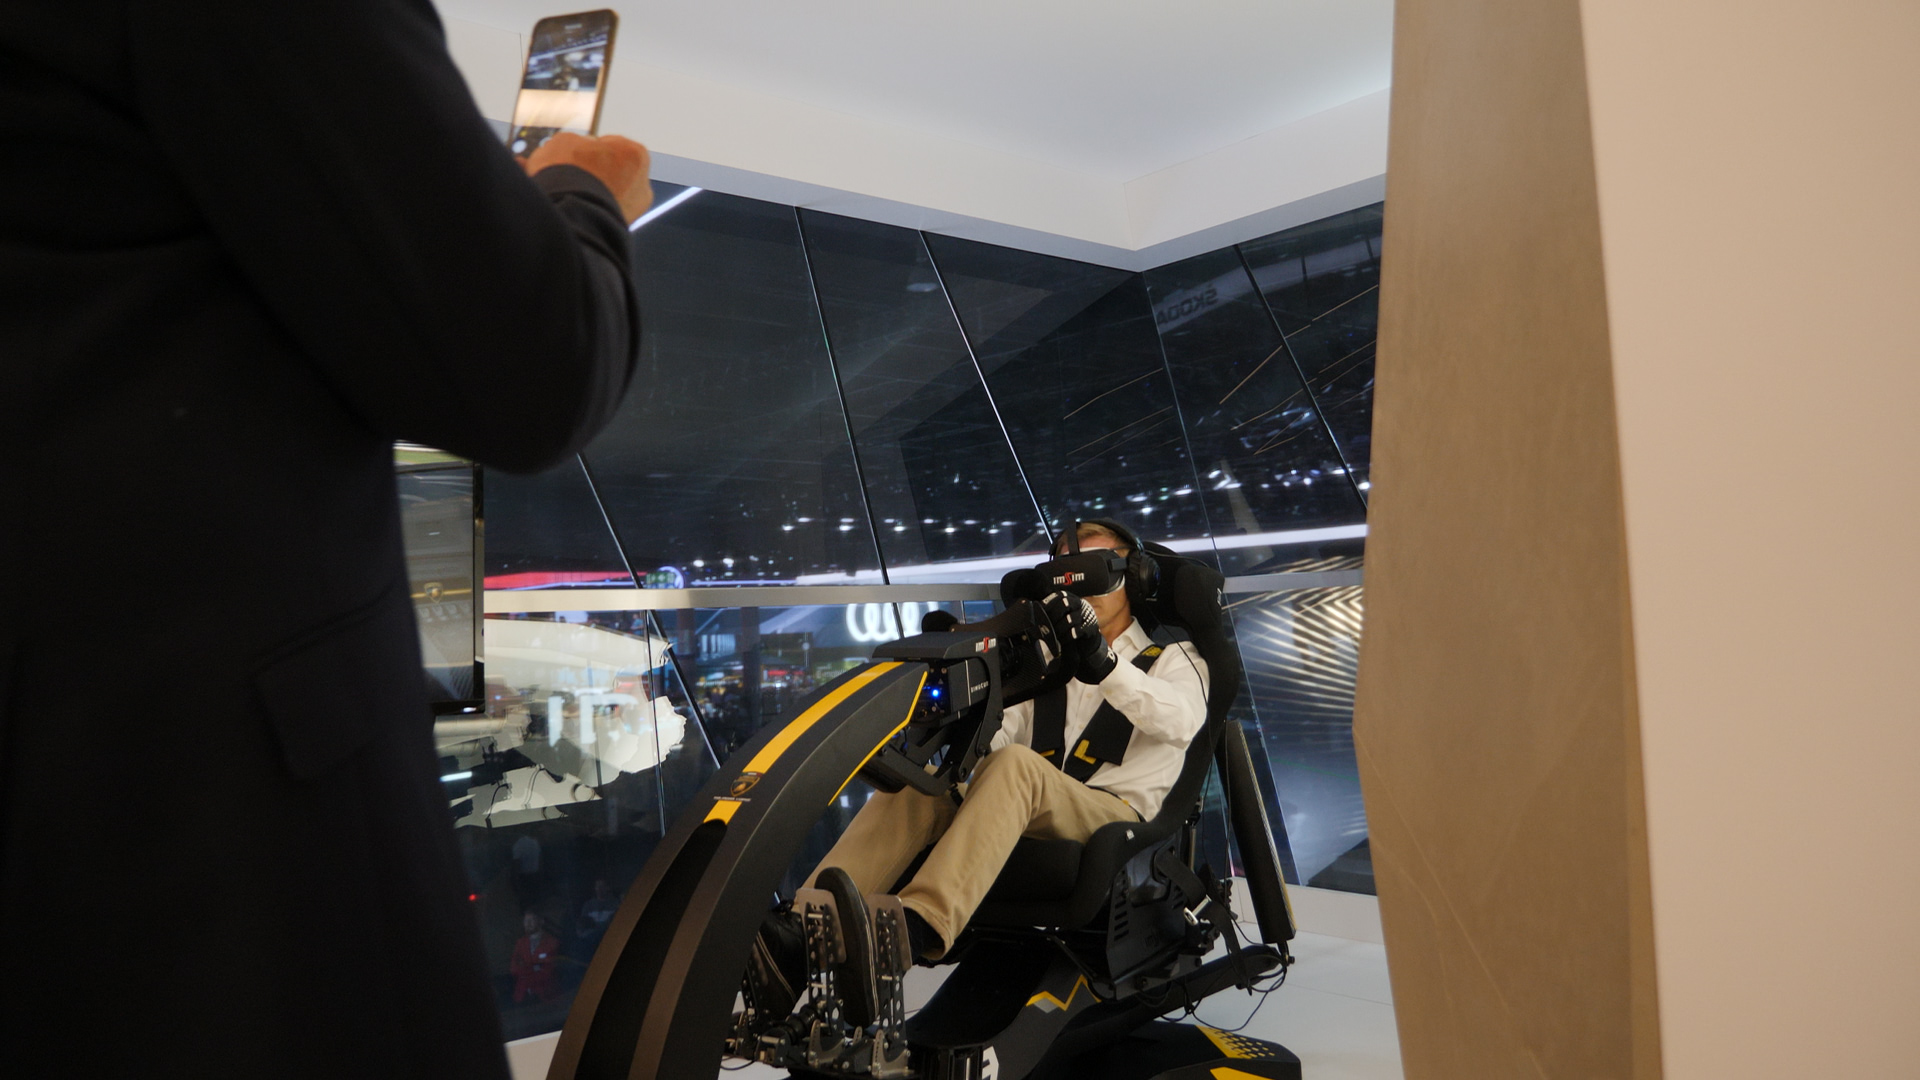 ImSim motion simulator Super Trofeo on a Automobili Lamborghini vip lounge